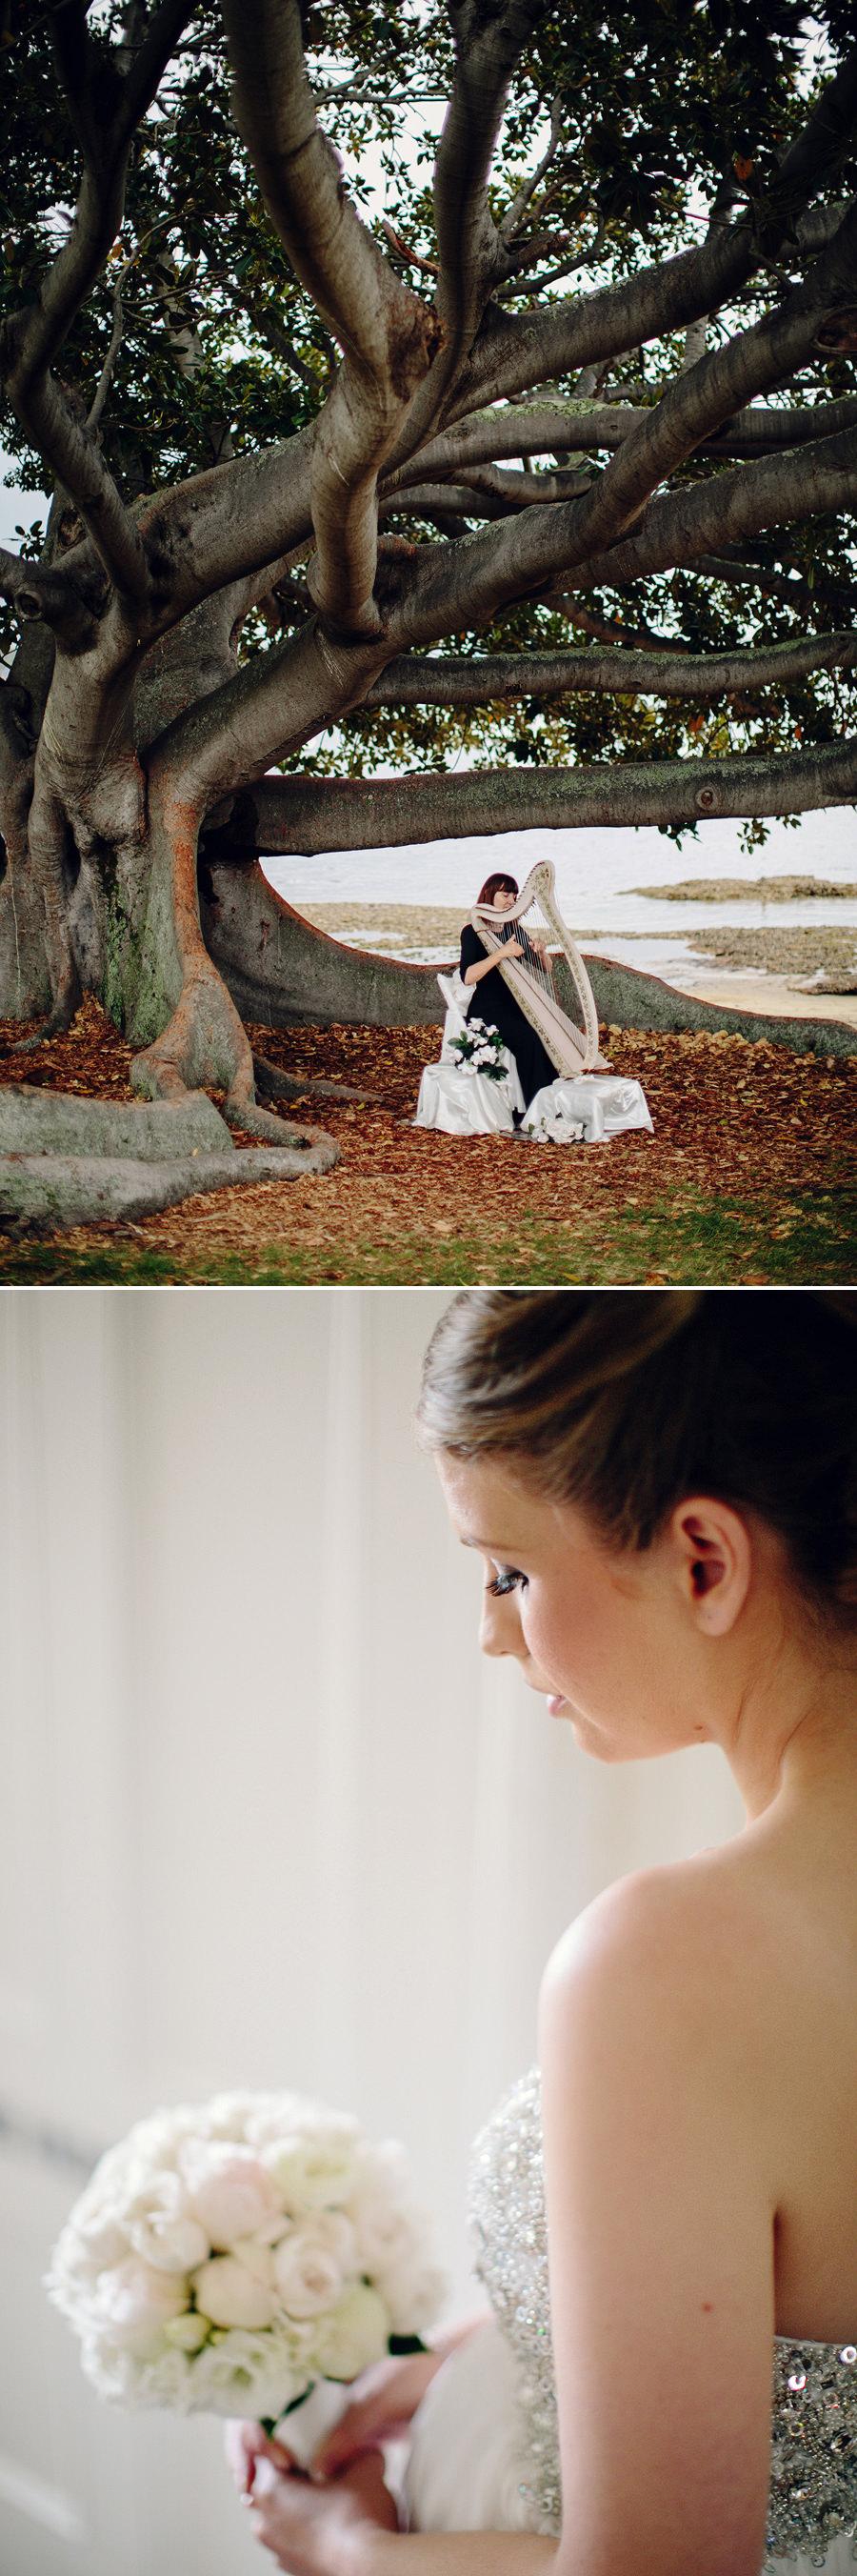 Watsons Bay Wedding Photographer: Harpist